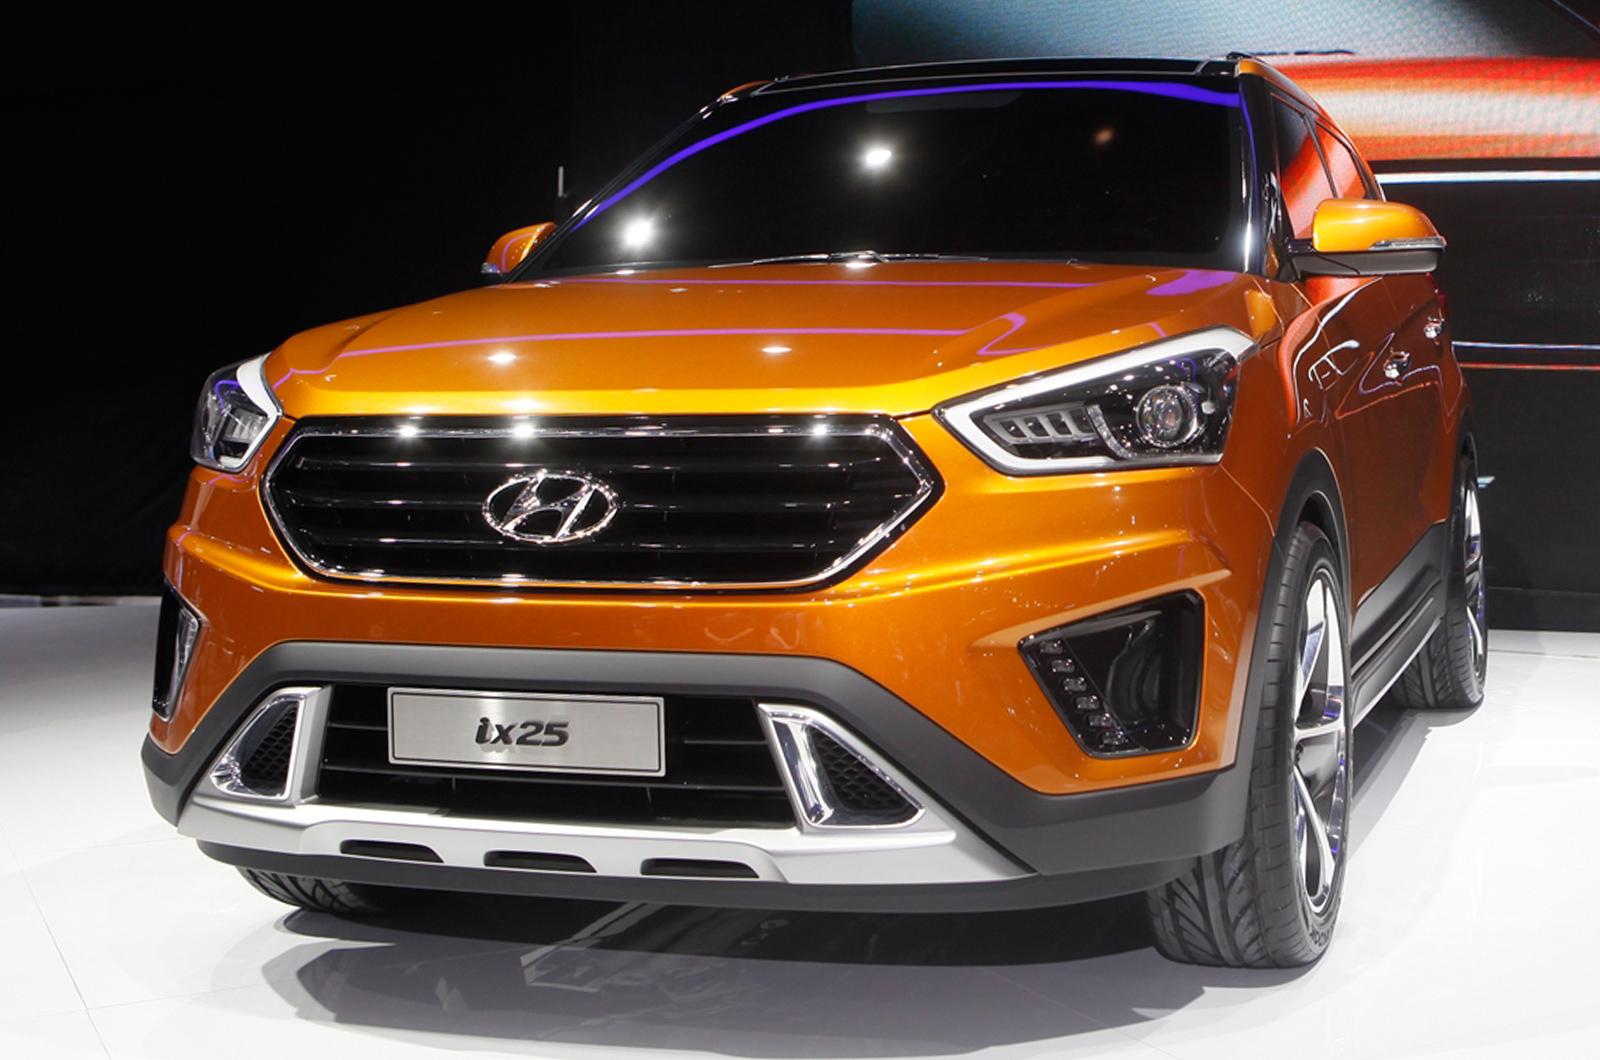 2014 - [Hyundai] iX-25 - Page 3 Hyundai-concept-ix25-1-2